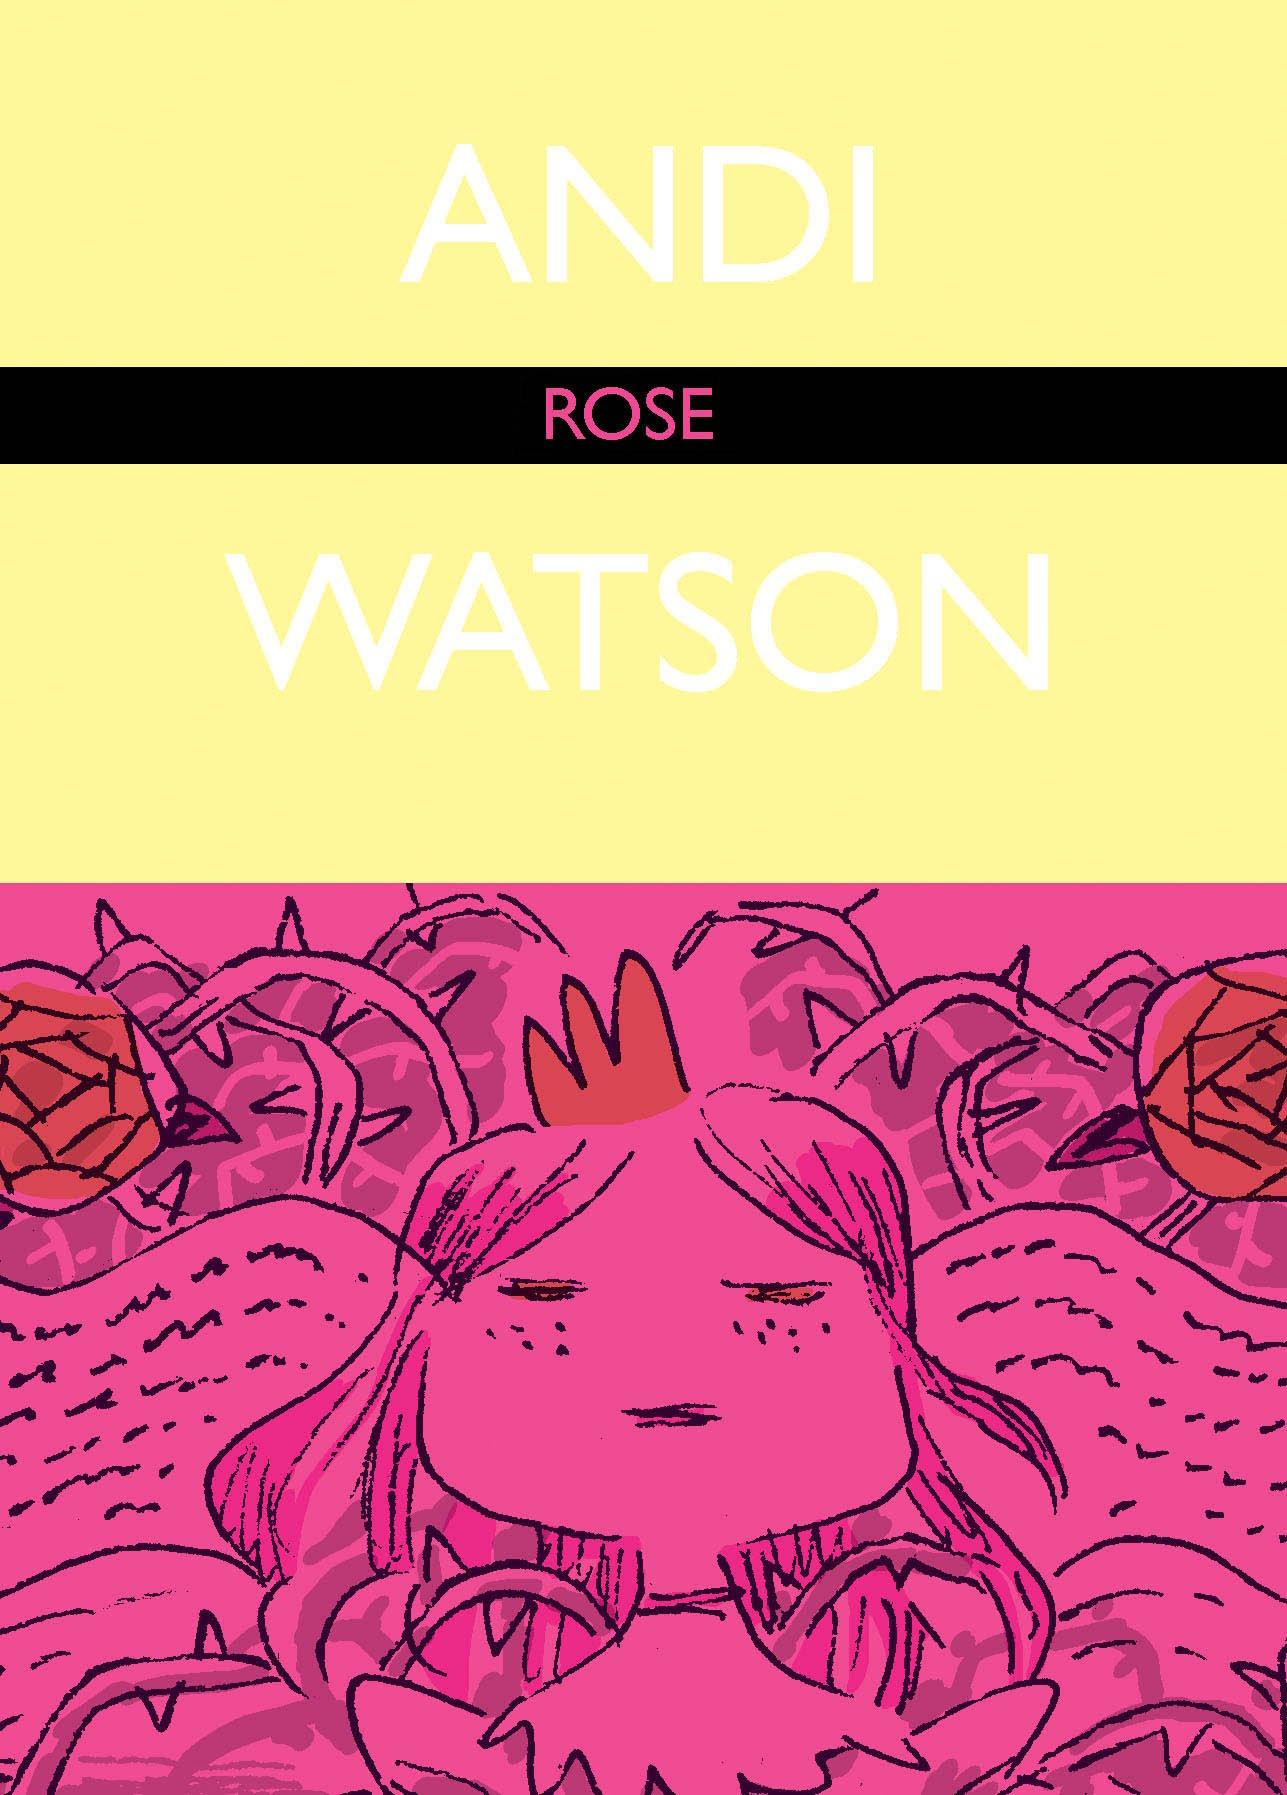 Image of Rose mini comic